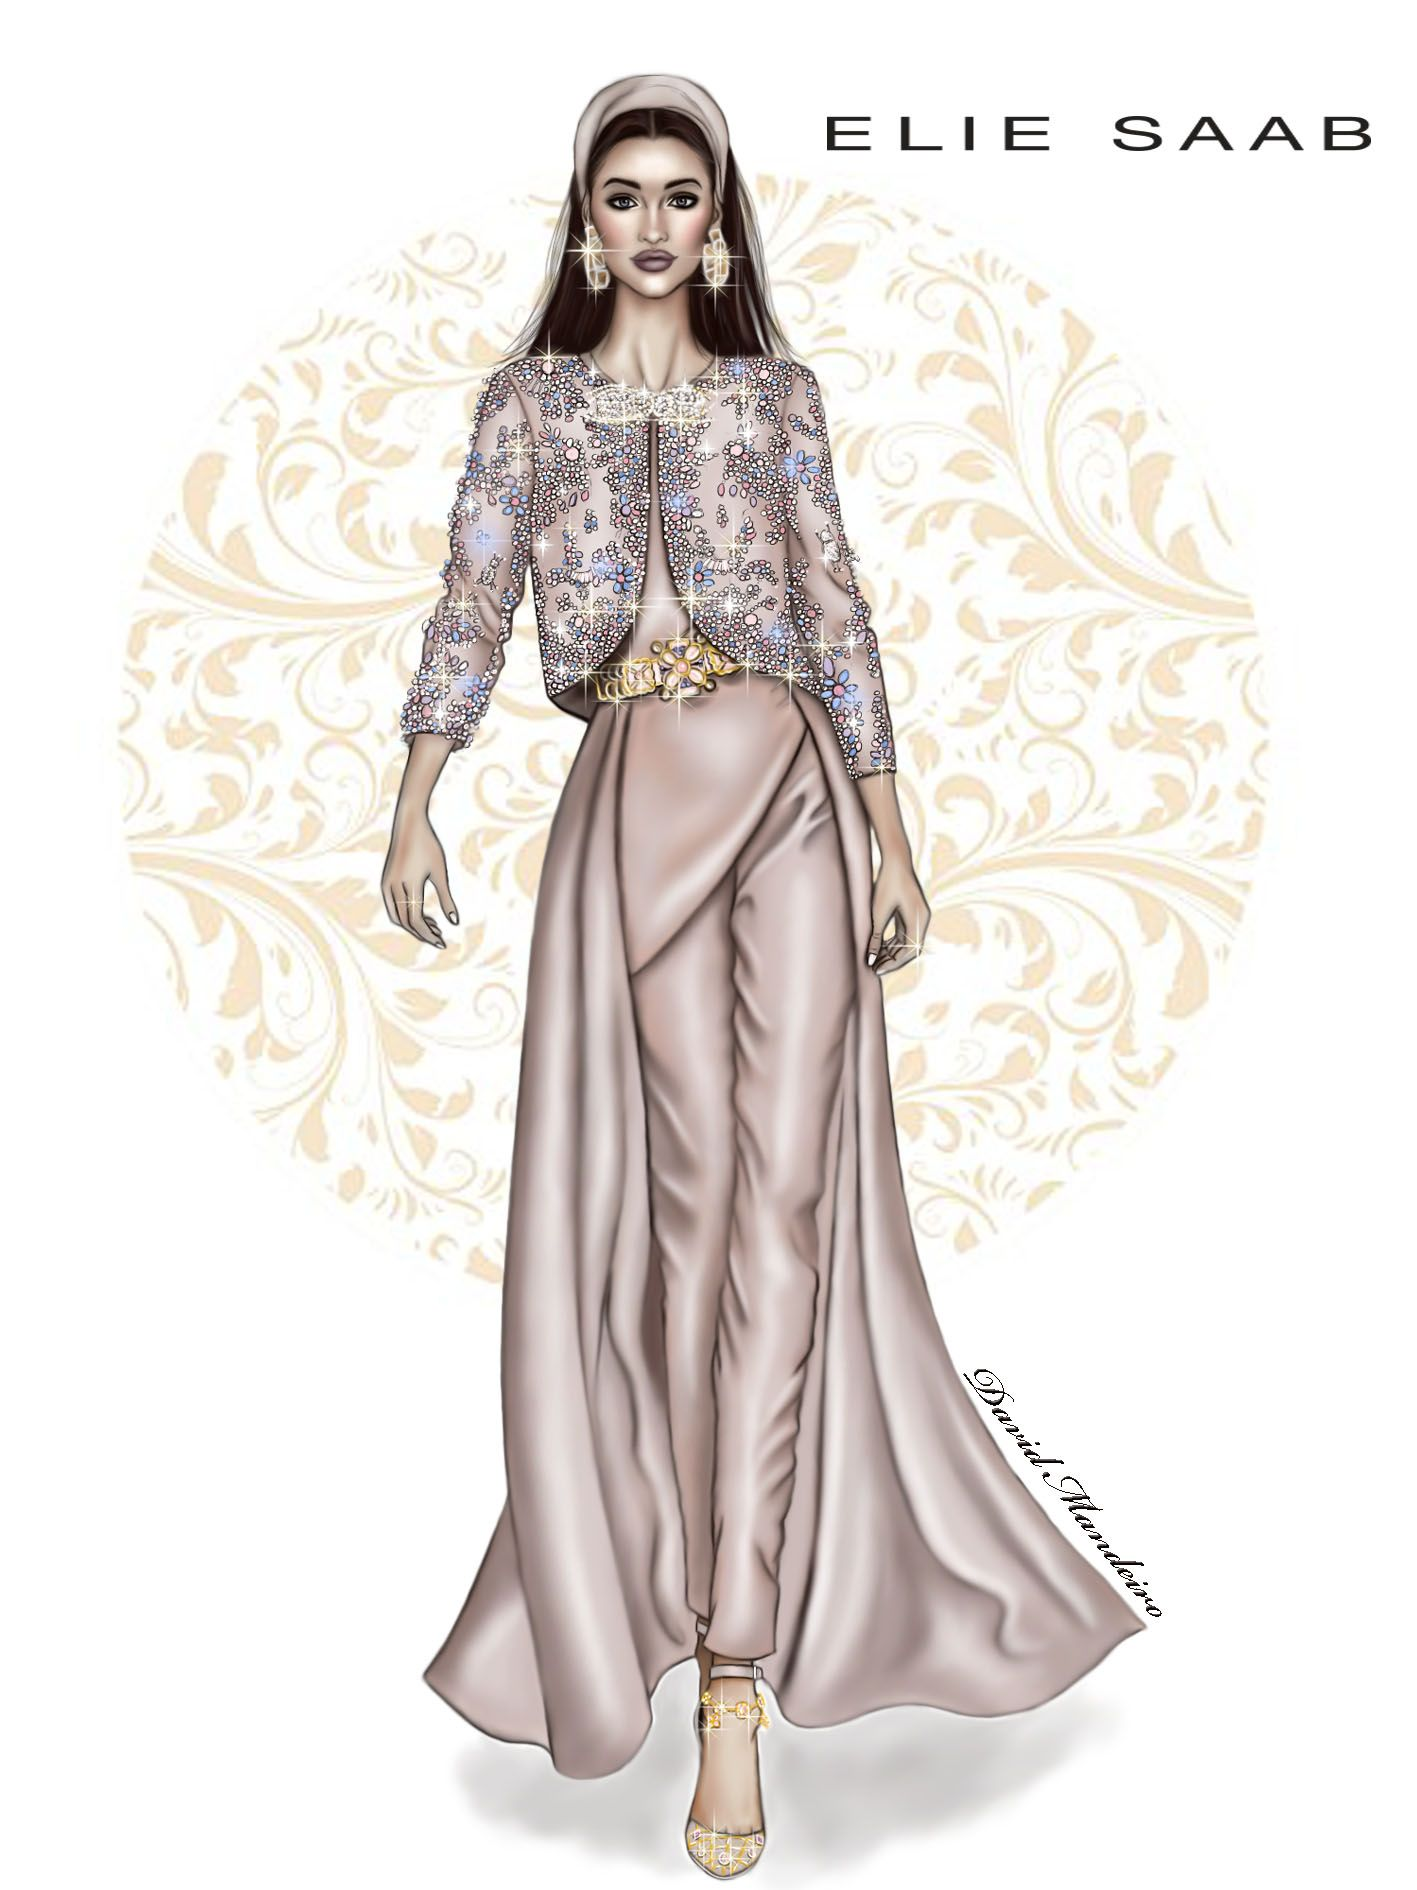 Elie Saab Haute Couture! By David Mandeiro